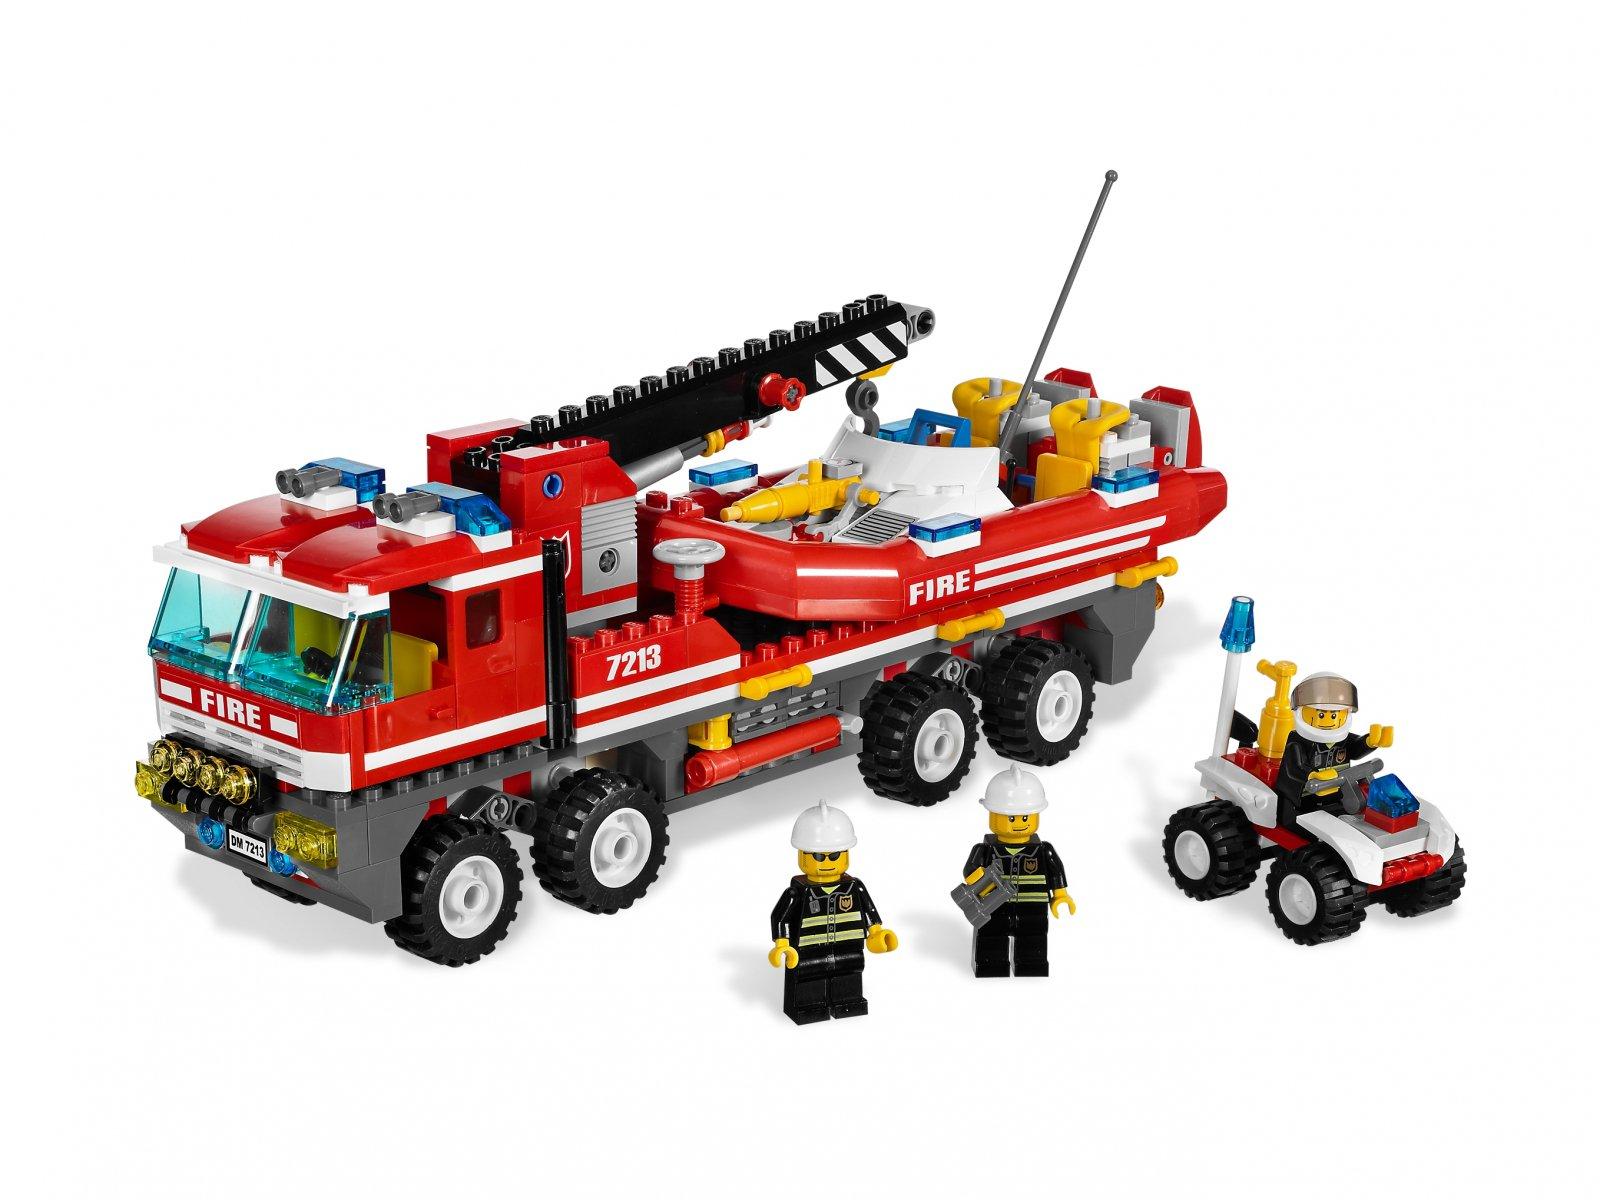 LEGO City 7213 Off-Road Fire Truck & Fireboat